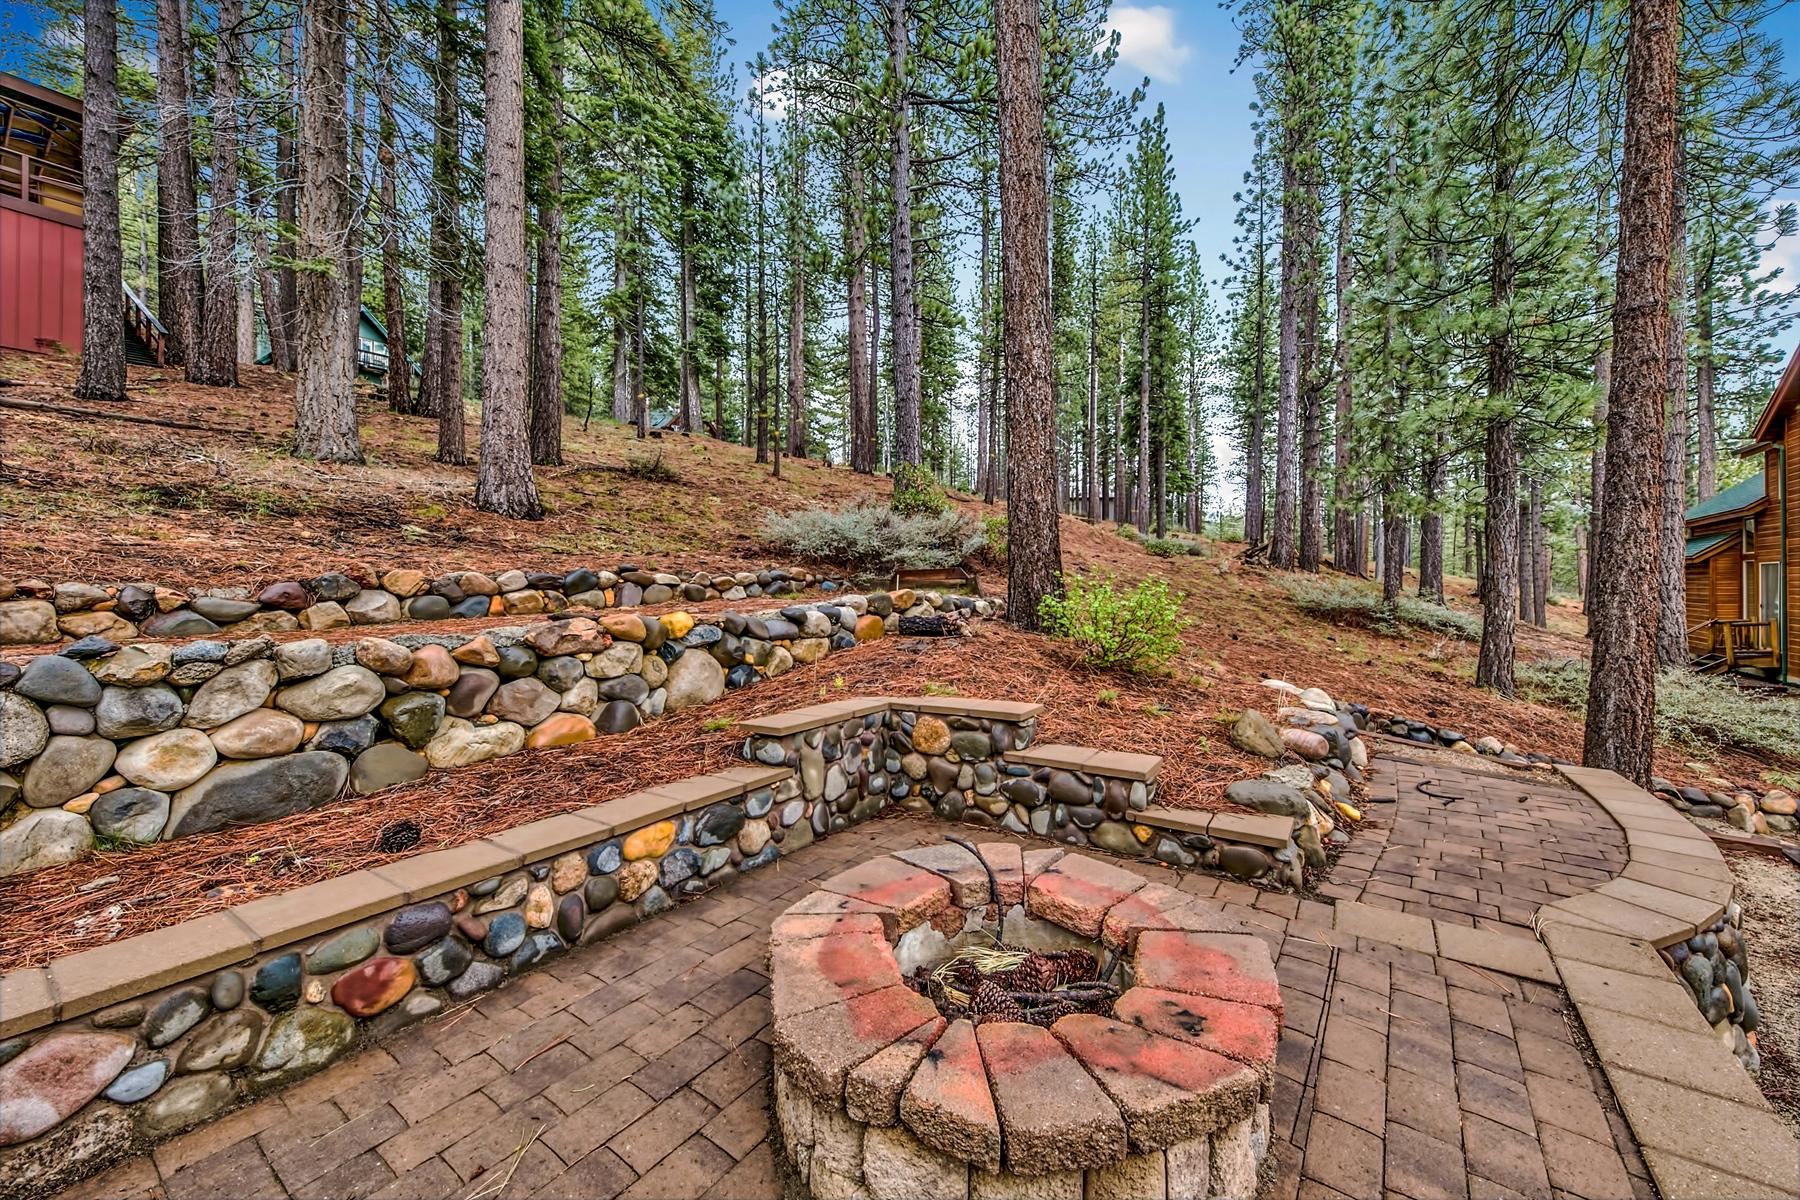 Additional photo for property listing at 2240 Columbine Trail, South Lake Tahoe, CA 96150 2240 Columbine Trail South Lake Tahoe, California 96150 Estados Unidos